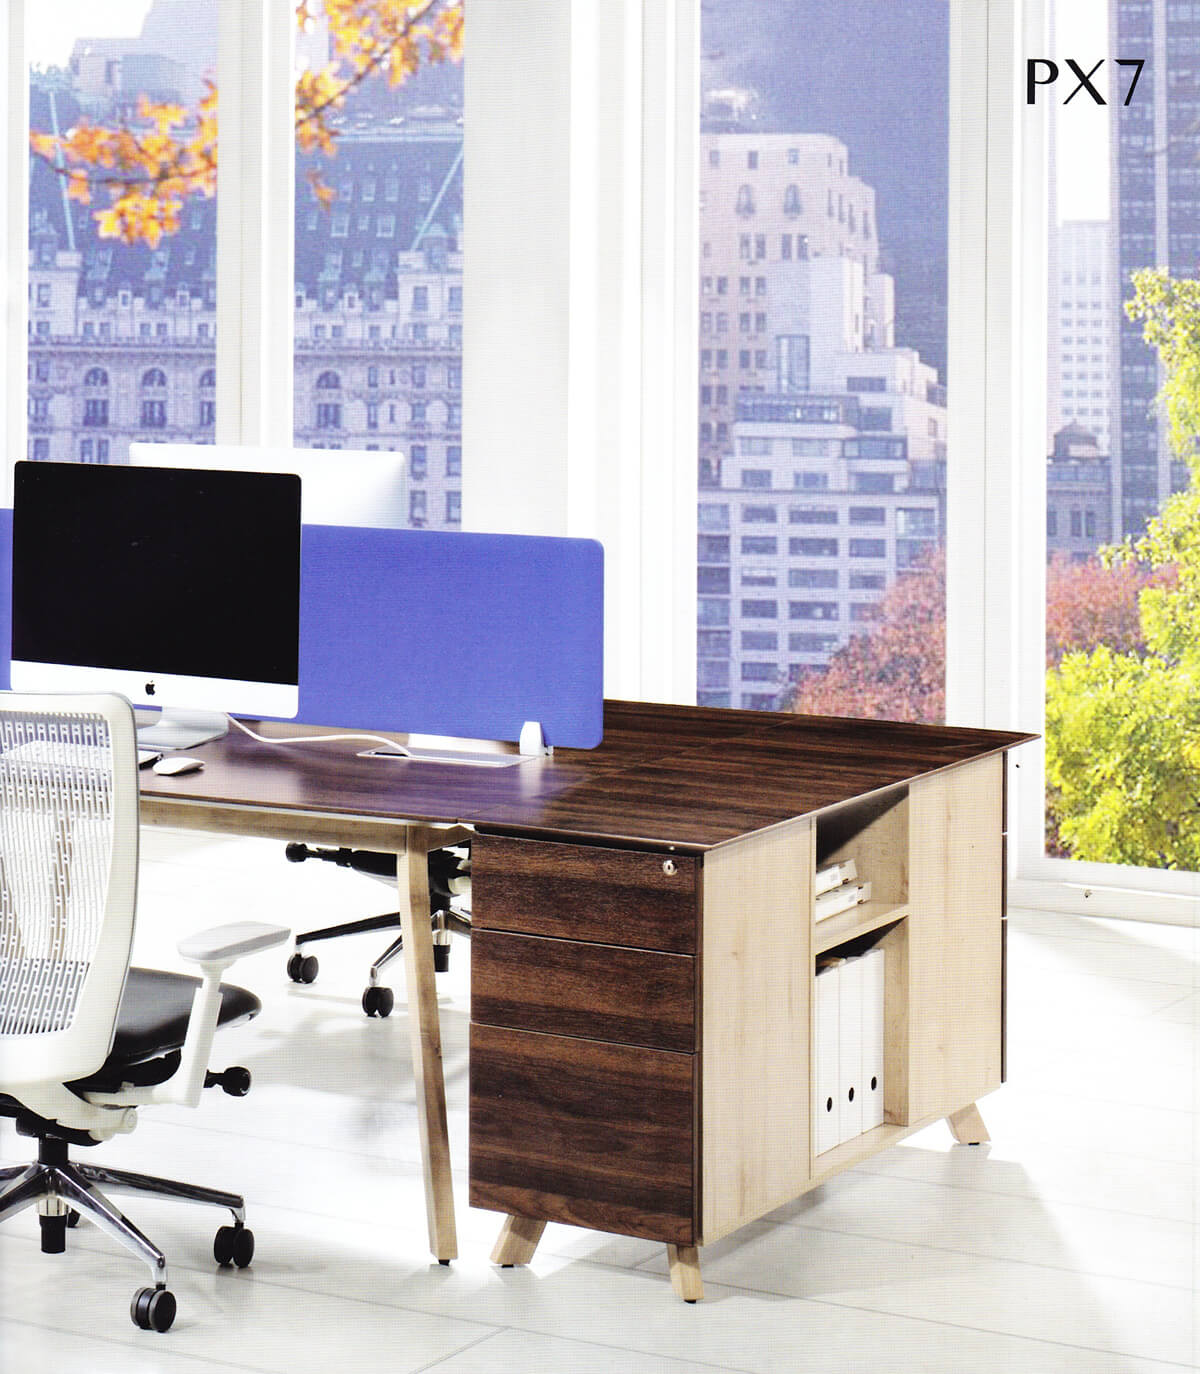 Standard Office Furniture Office Supplier Flexxo